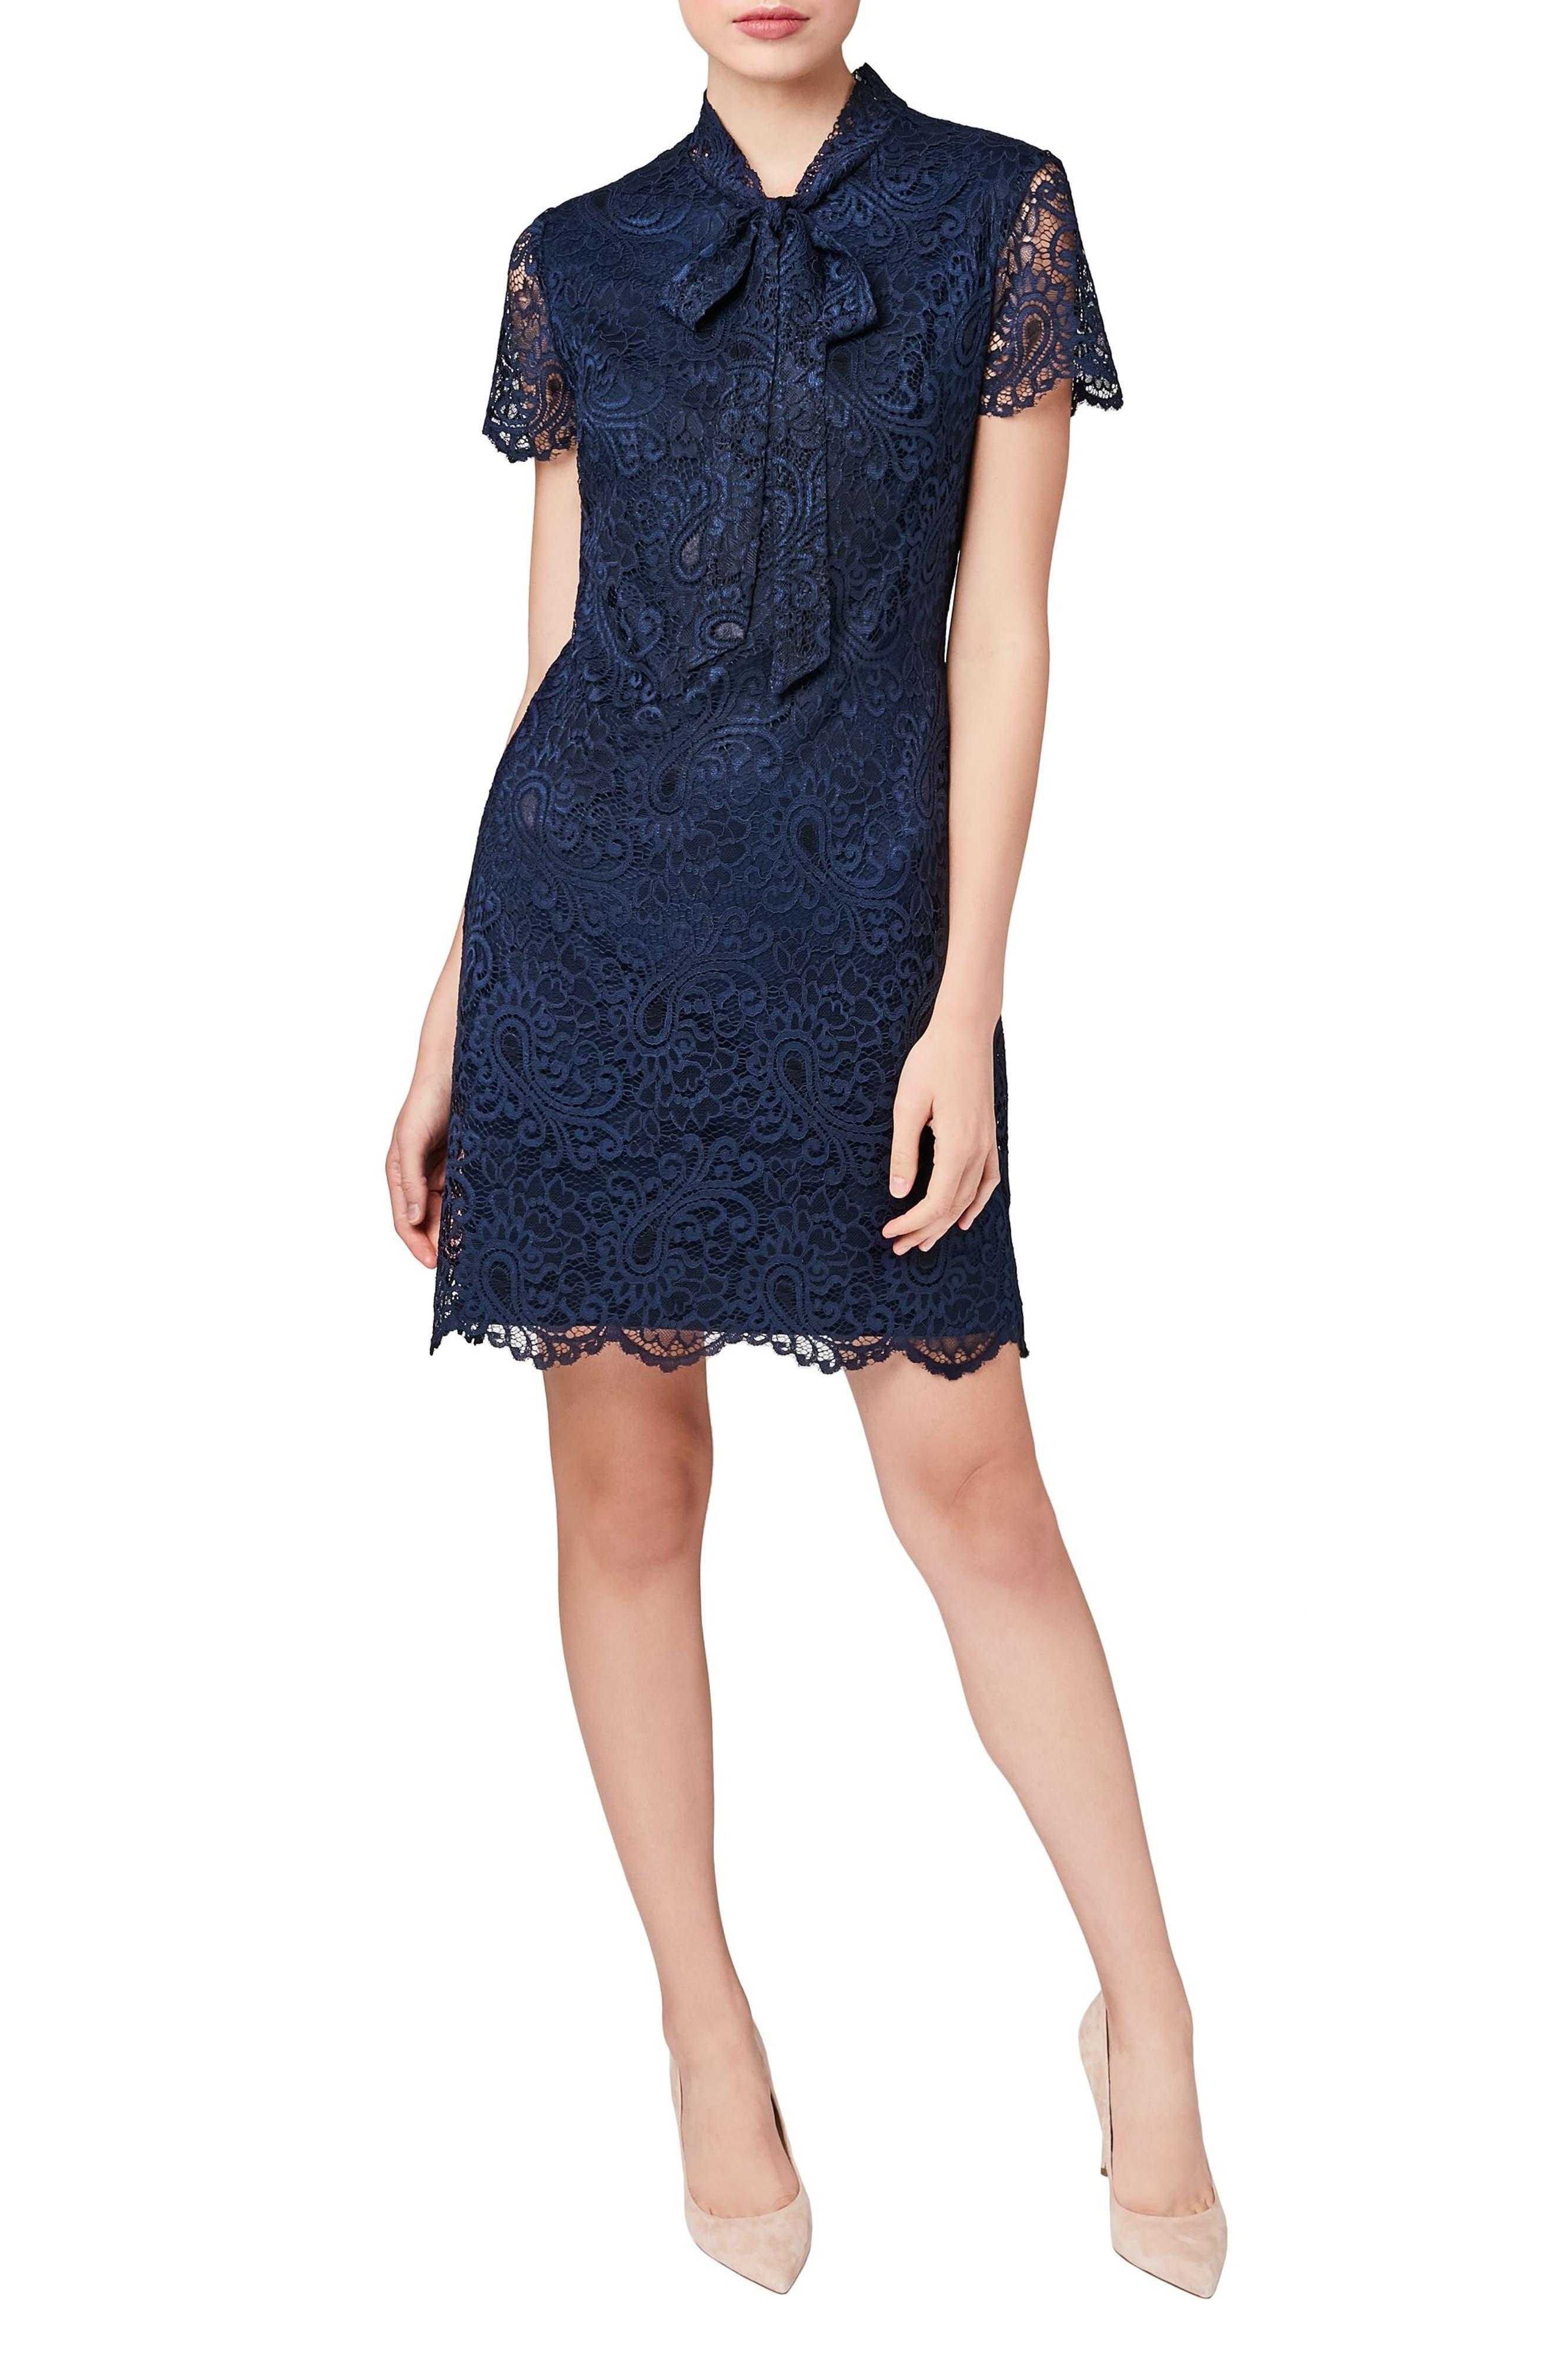 Main Image - Betsey Johnson Tie Neck Lace A-Line Dress